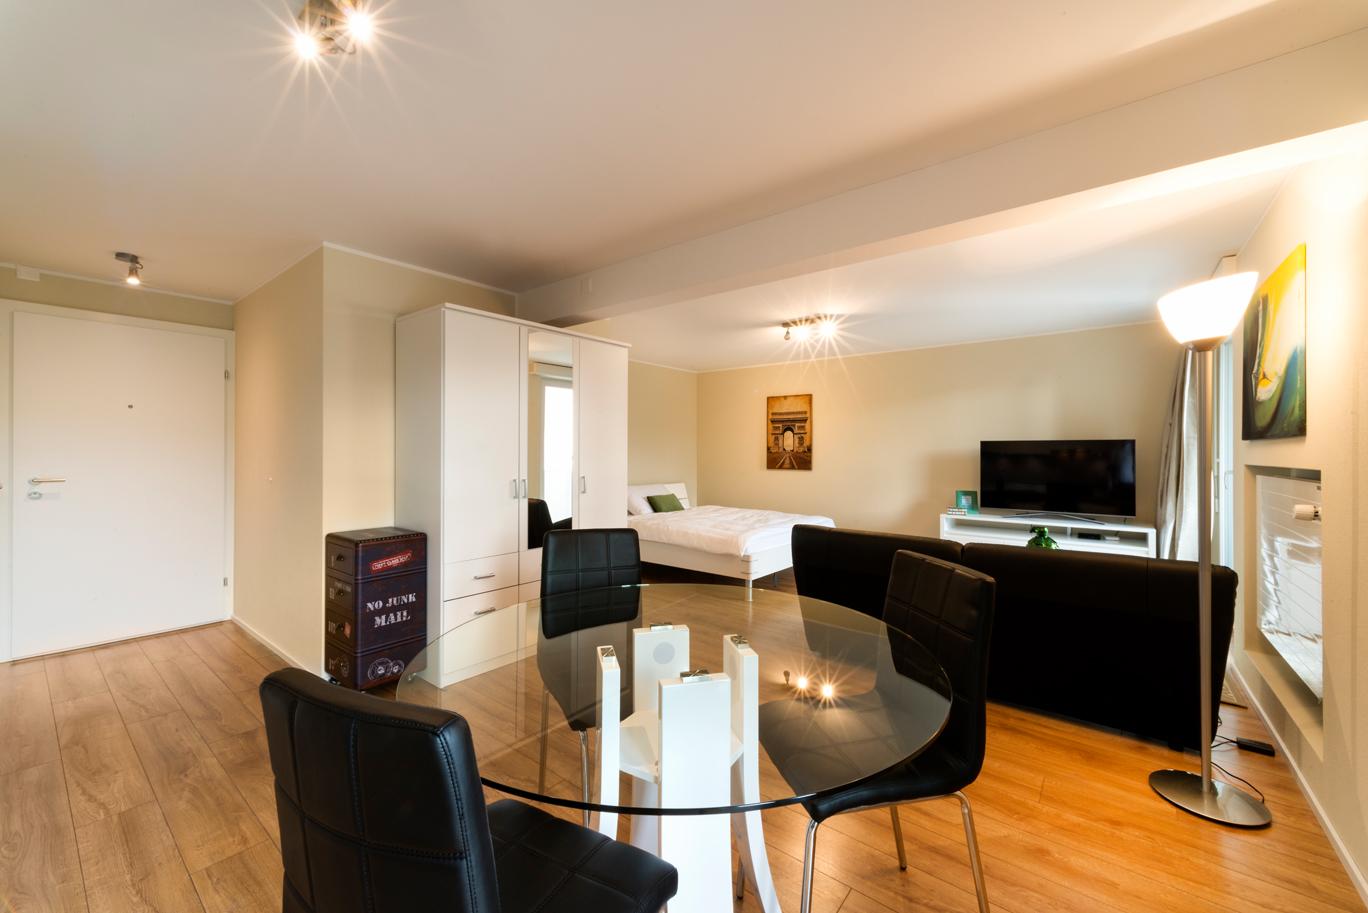 mercury 1 5 zimmer apartment in wallisellen reloc. Black Bedroom Furniture Sets. Home Design Ideas